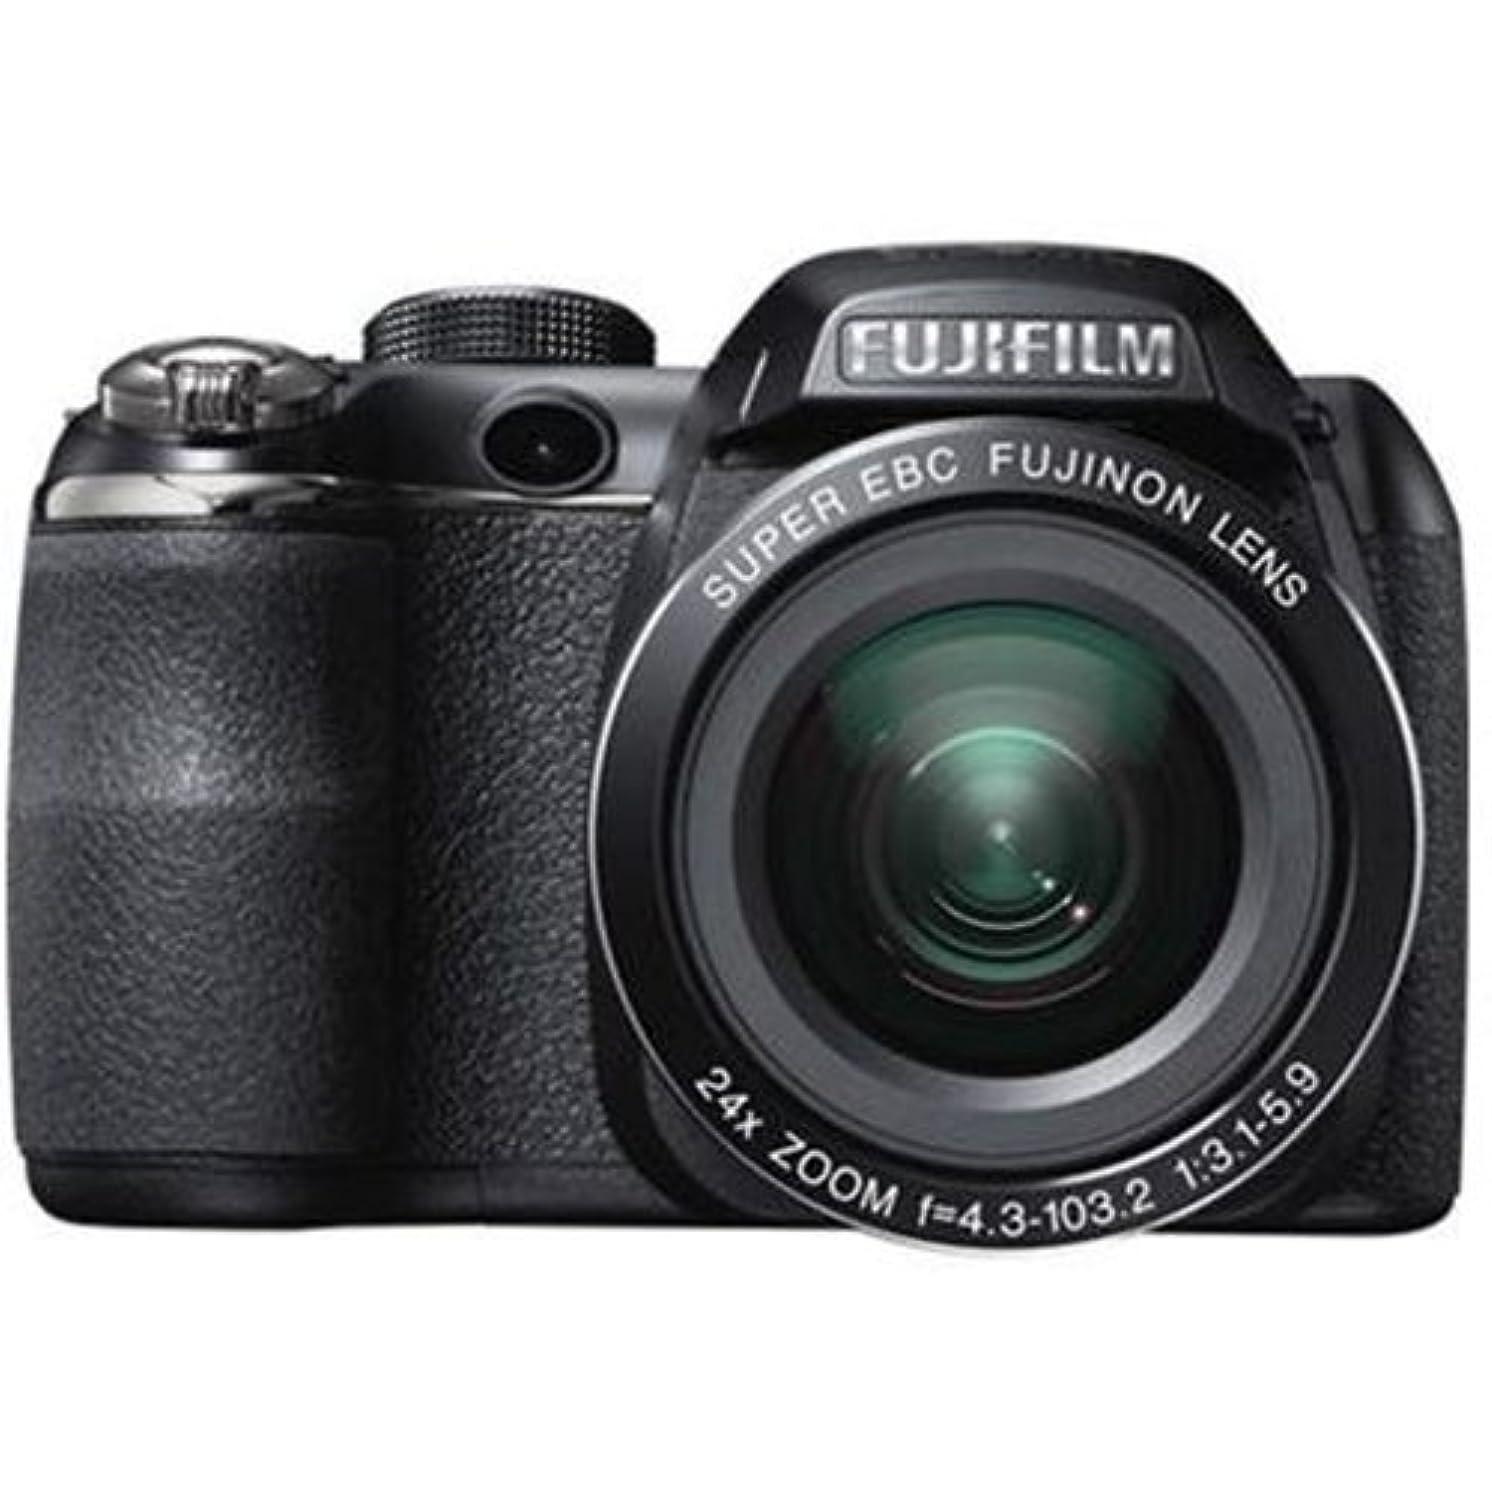 Fujifilm FinePix S4250 14MP 24x Optical Zoom Digital Camera (Black)